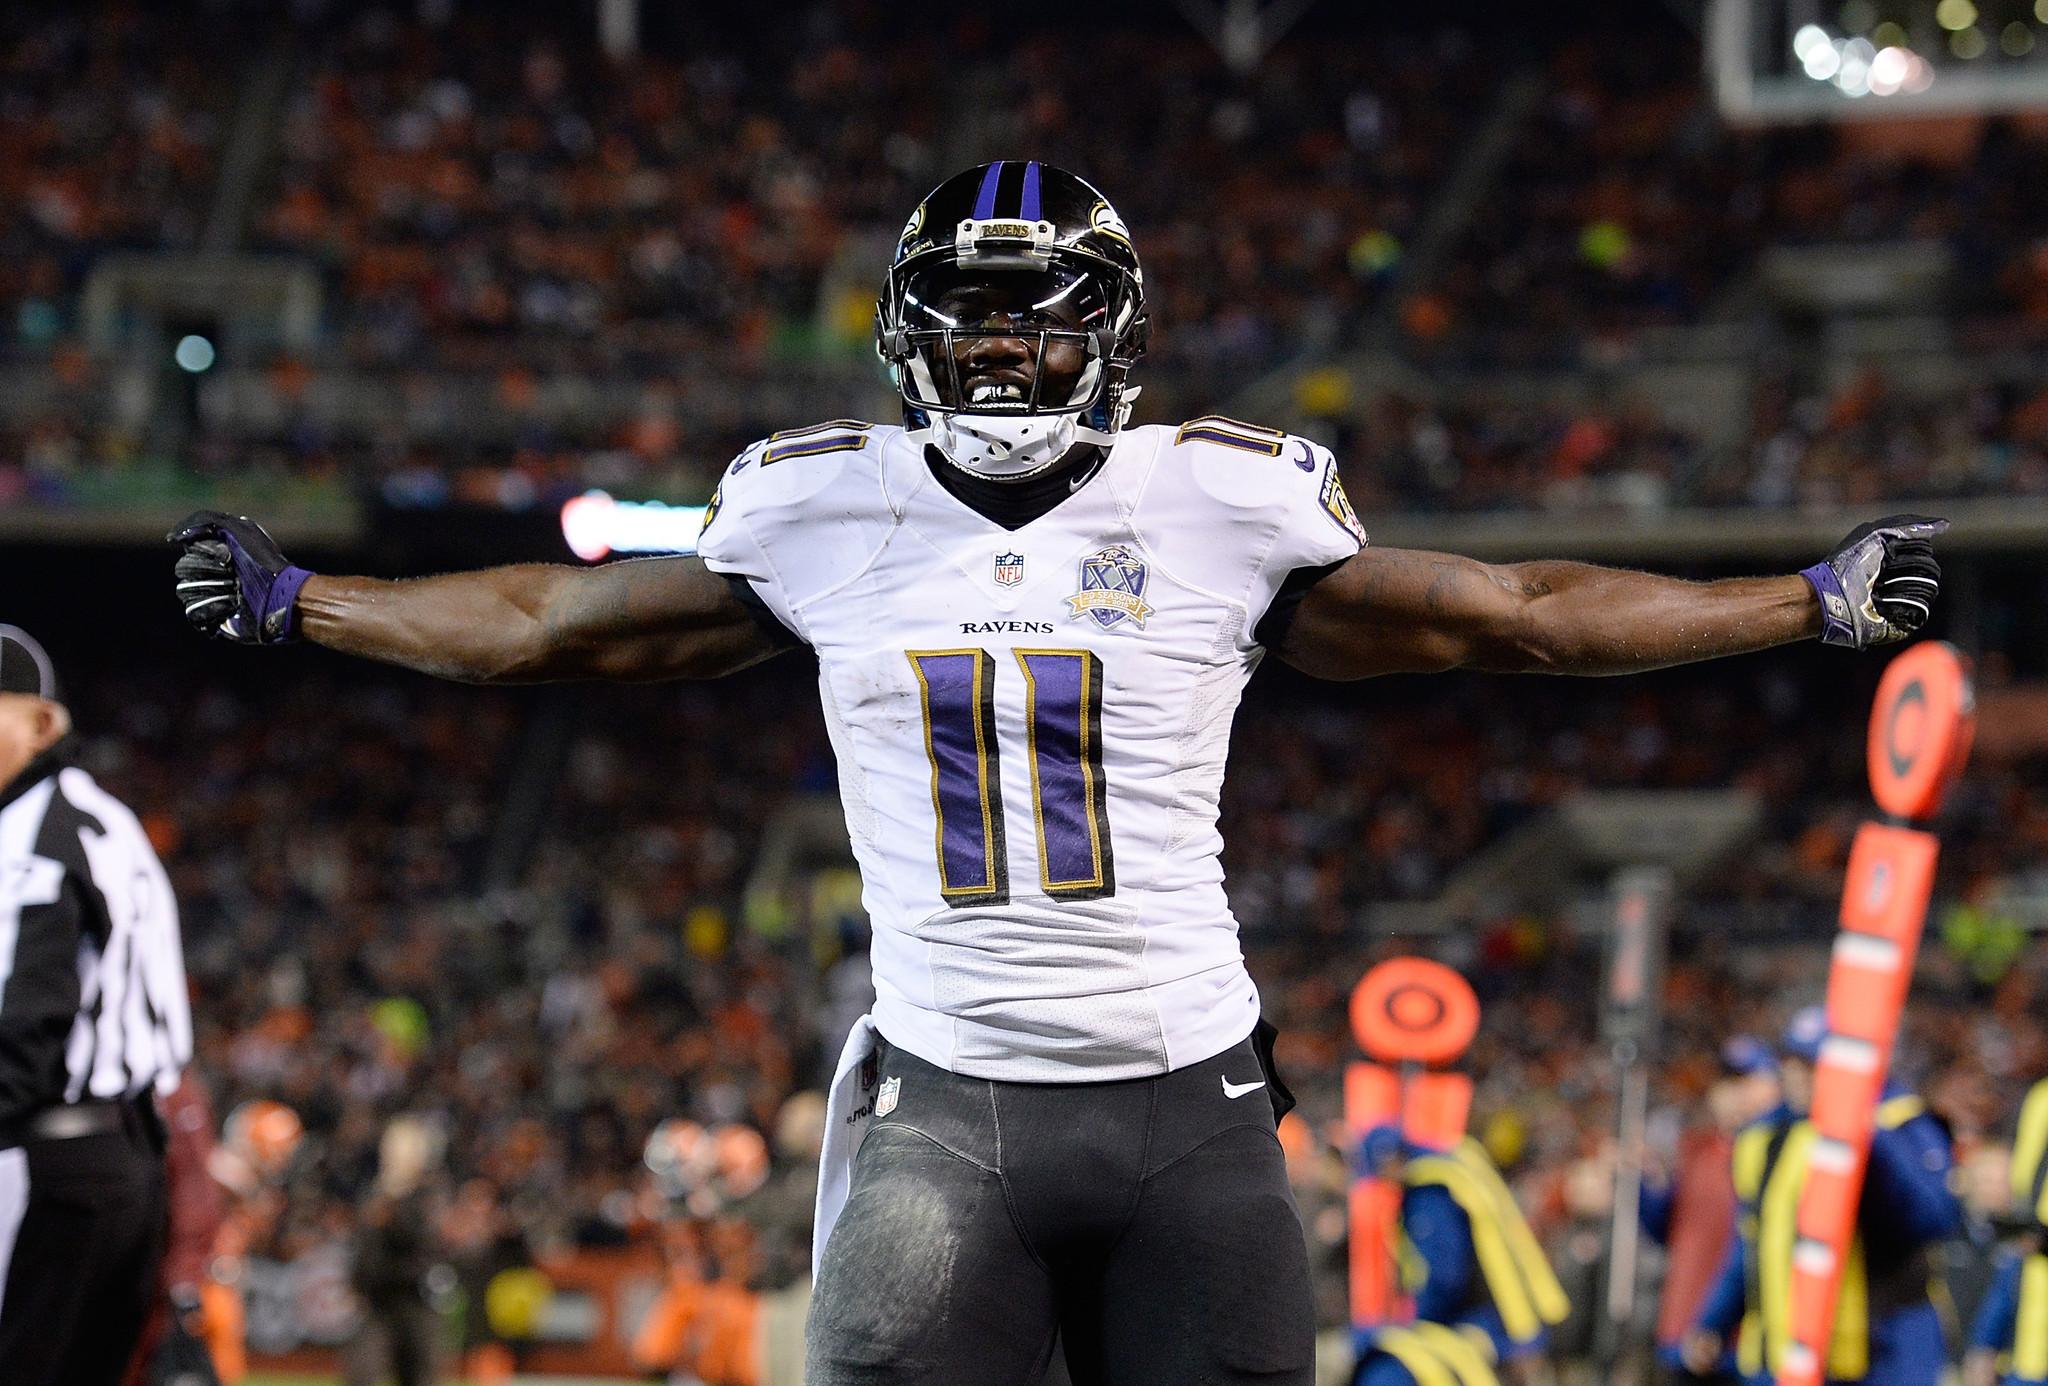 Ravens receiver Kamar Aiken making most of unlikely No. 1 role ...